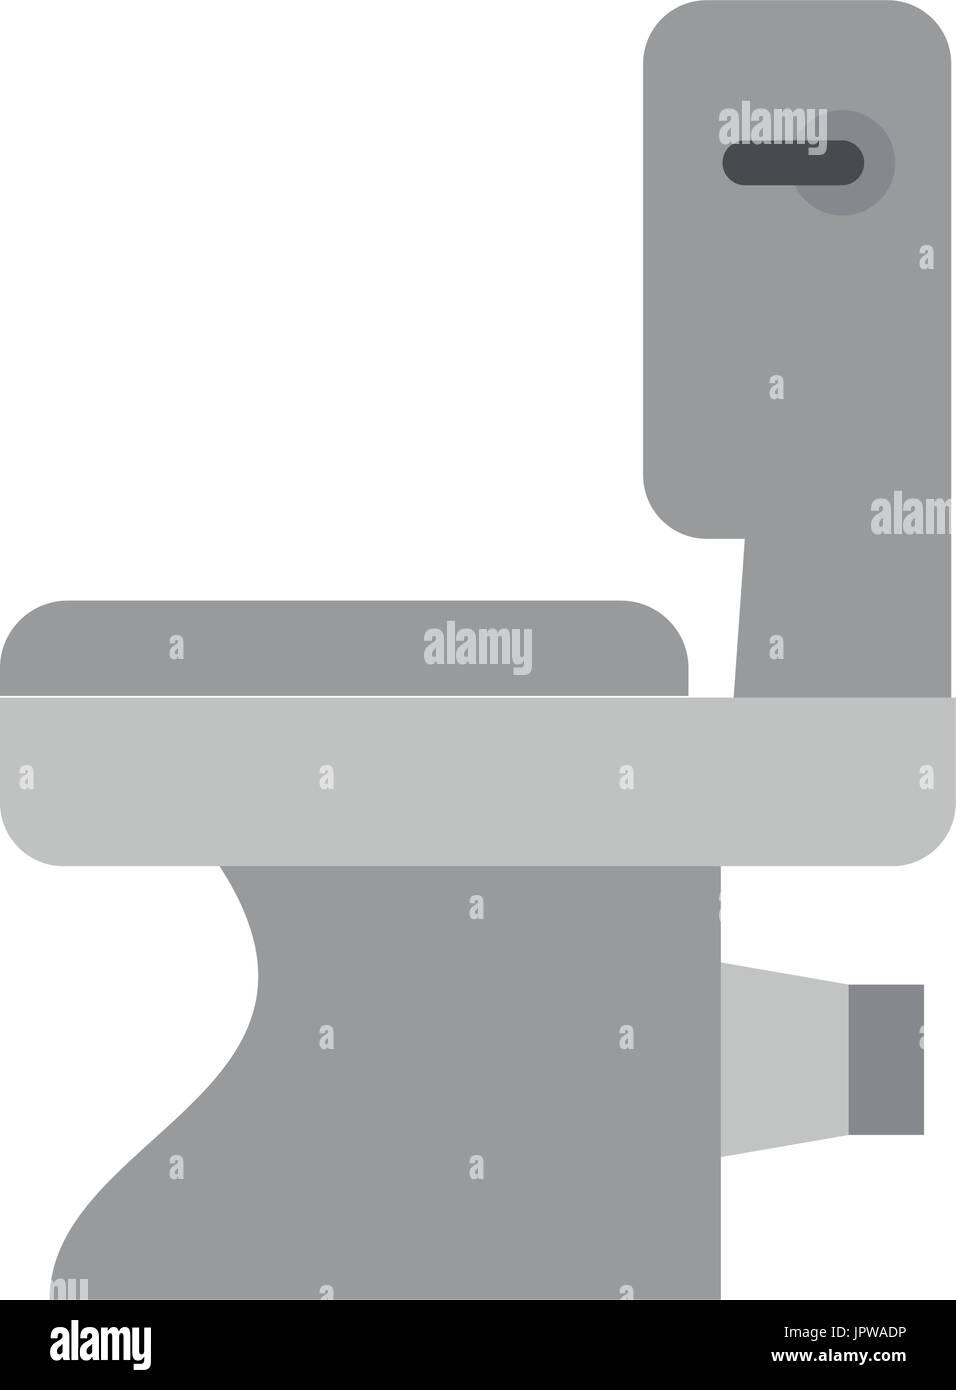 Bathware Stock Photos & Bathware Stock Images - Alamy